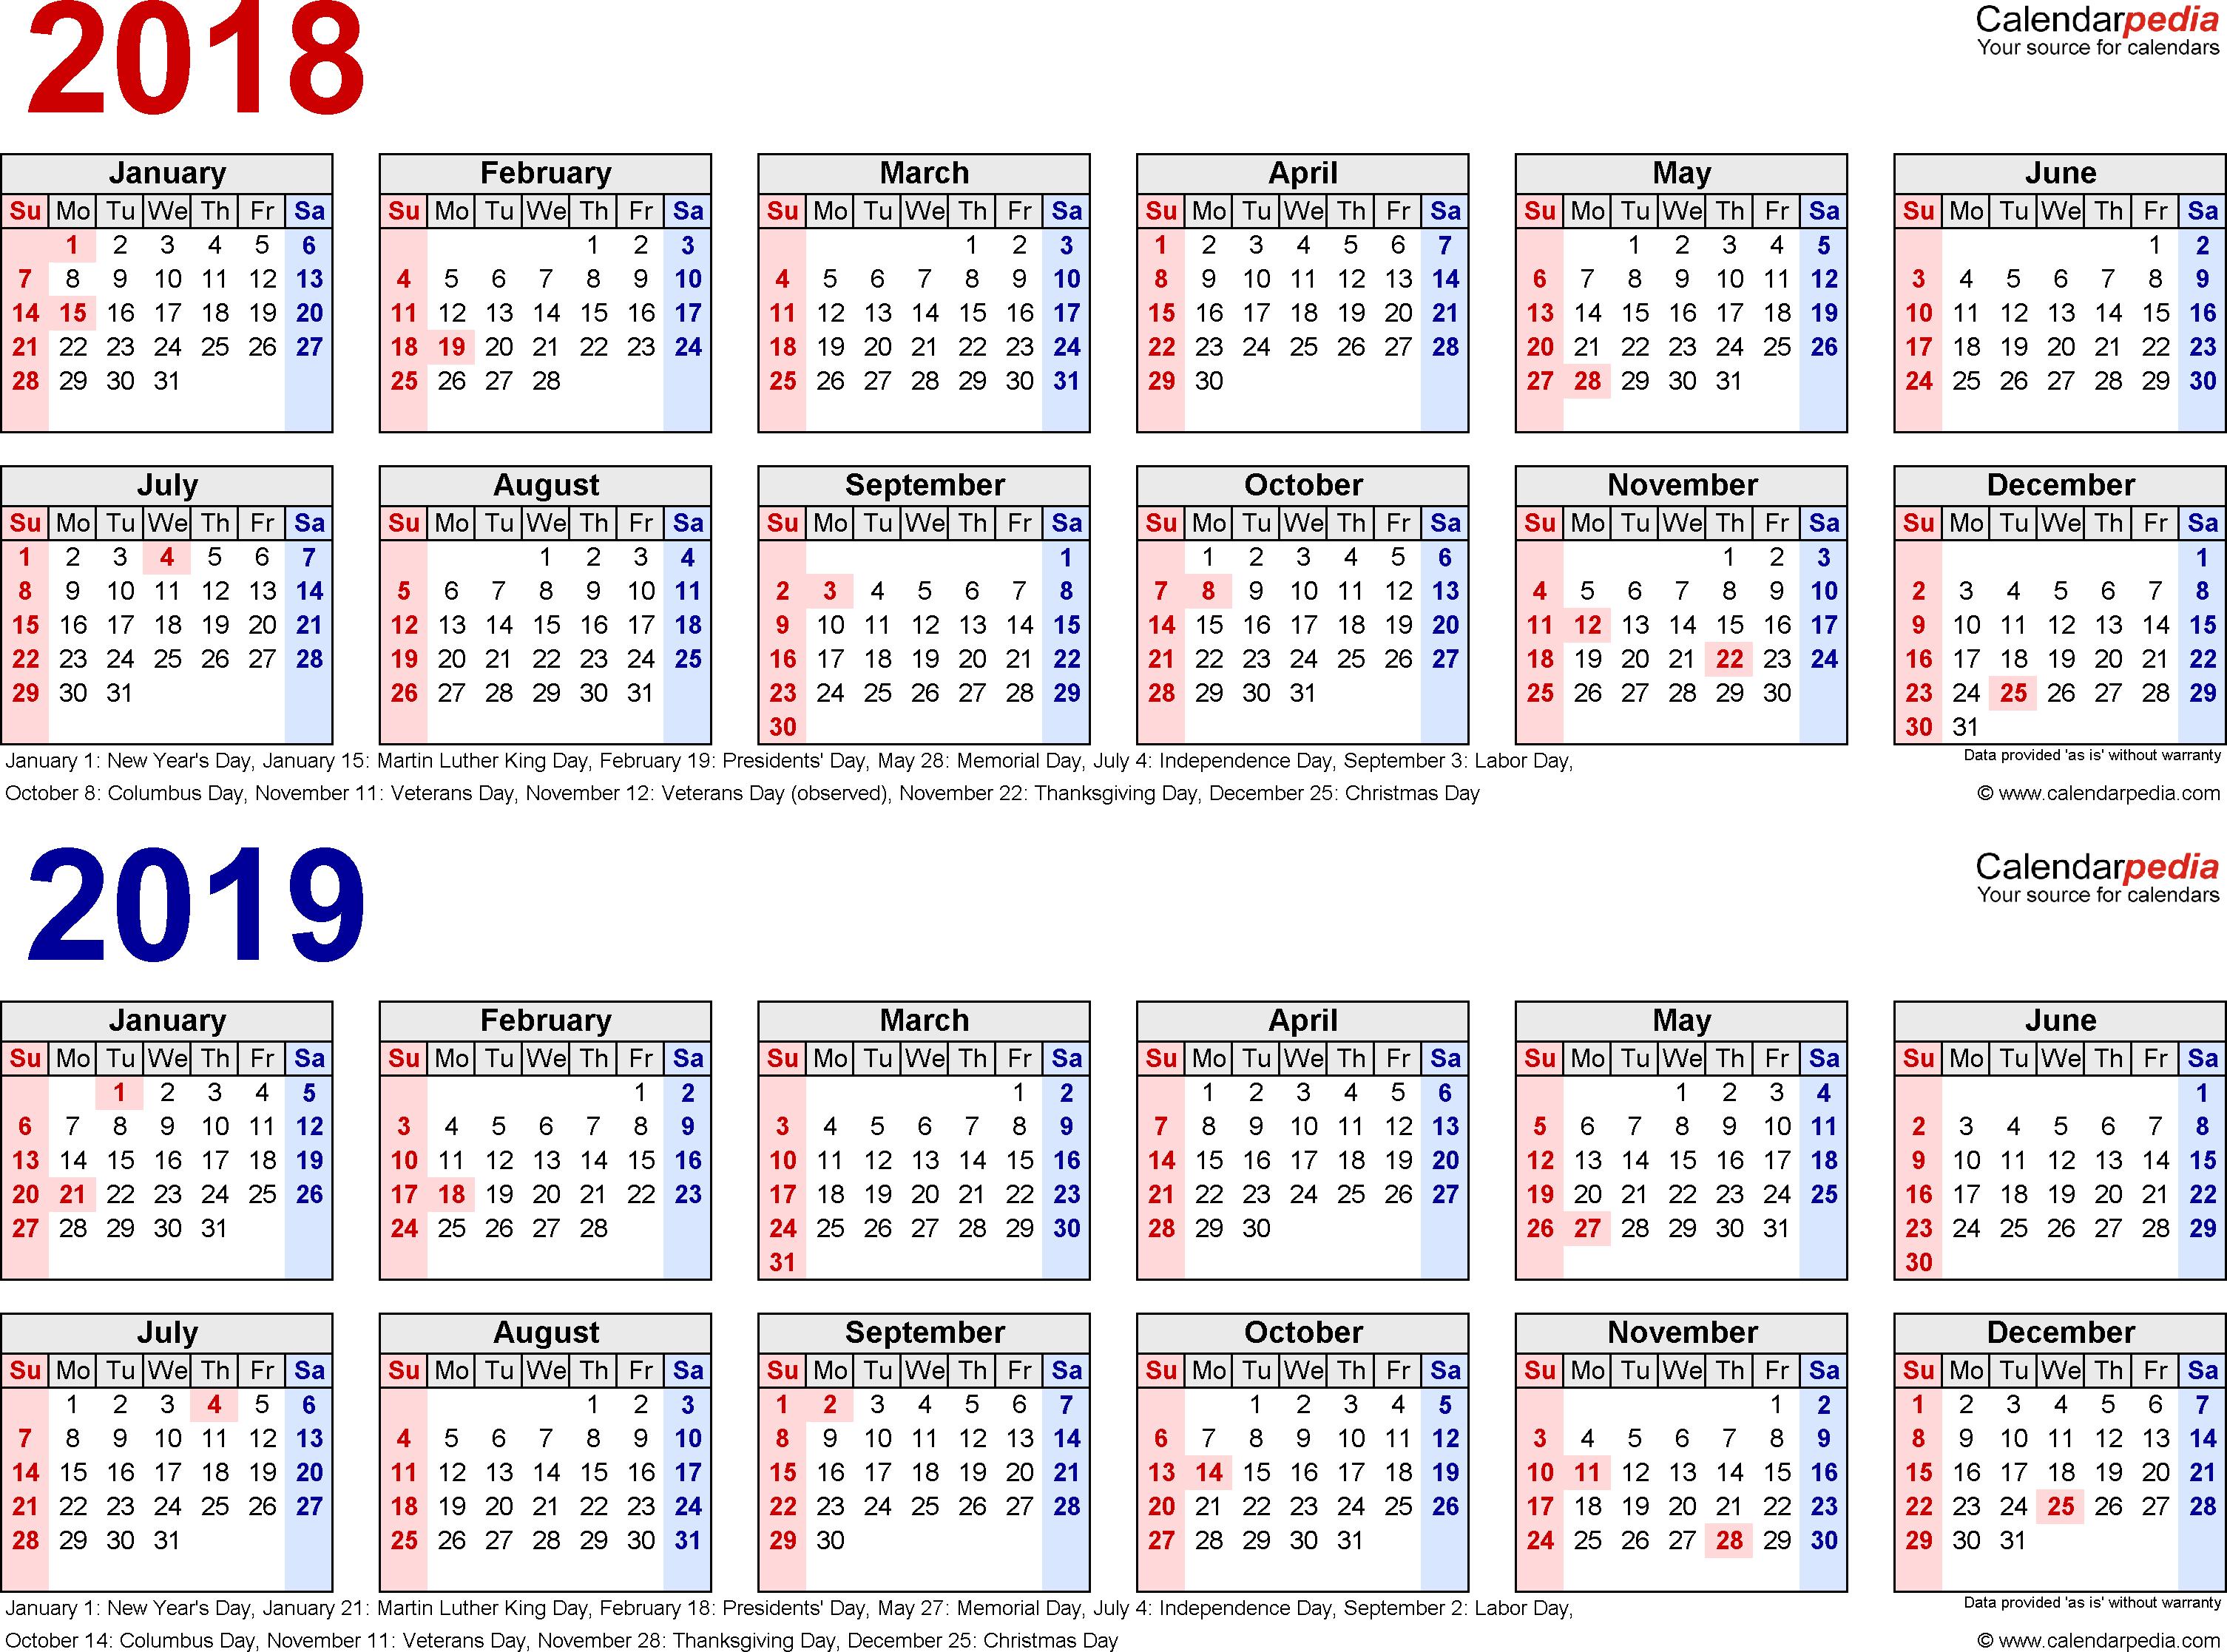 2018-2019 Calendar - Free Printable Two-Year Excel Calendars